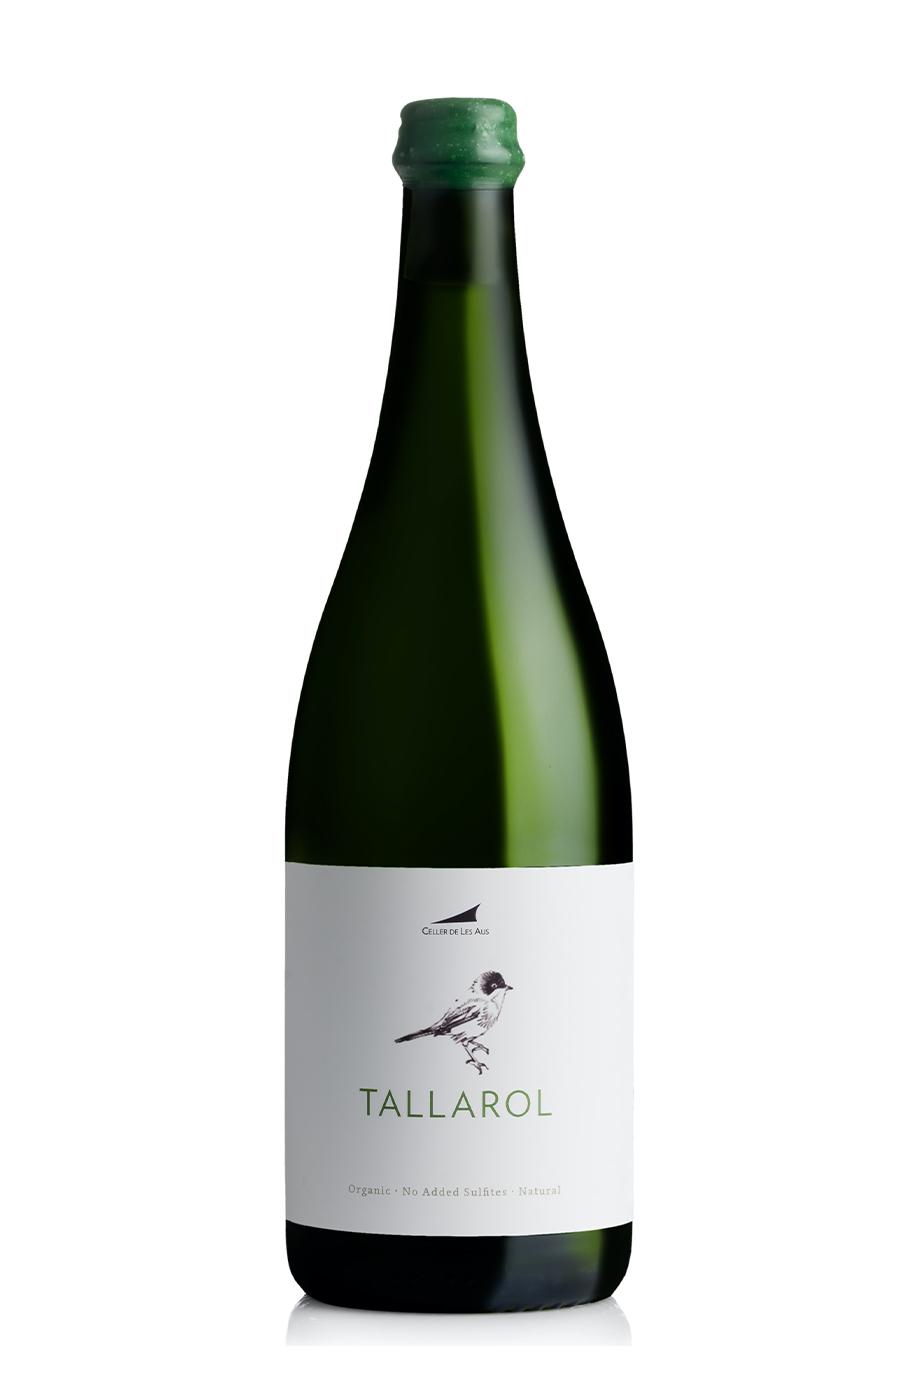 AA Tallarol | Celler de les Aus - Winexfood